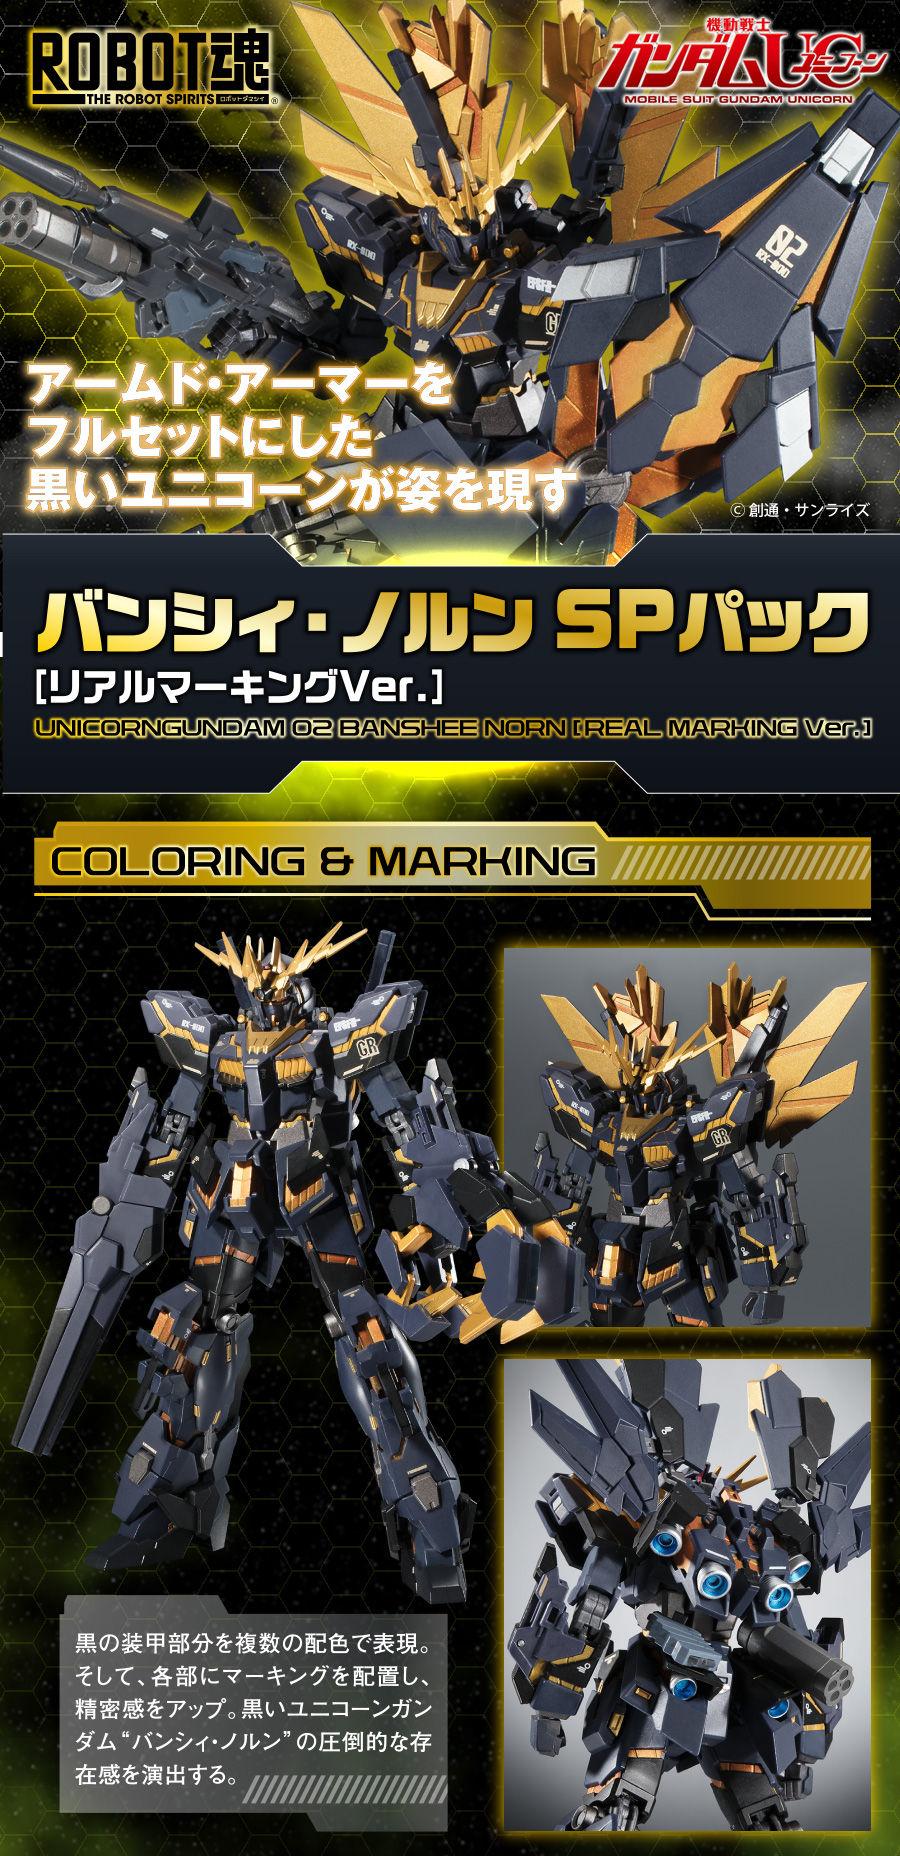 Gundam - Metal Robot Side MS (Bandai) - Page 3 IbJey7BS_o